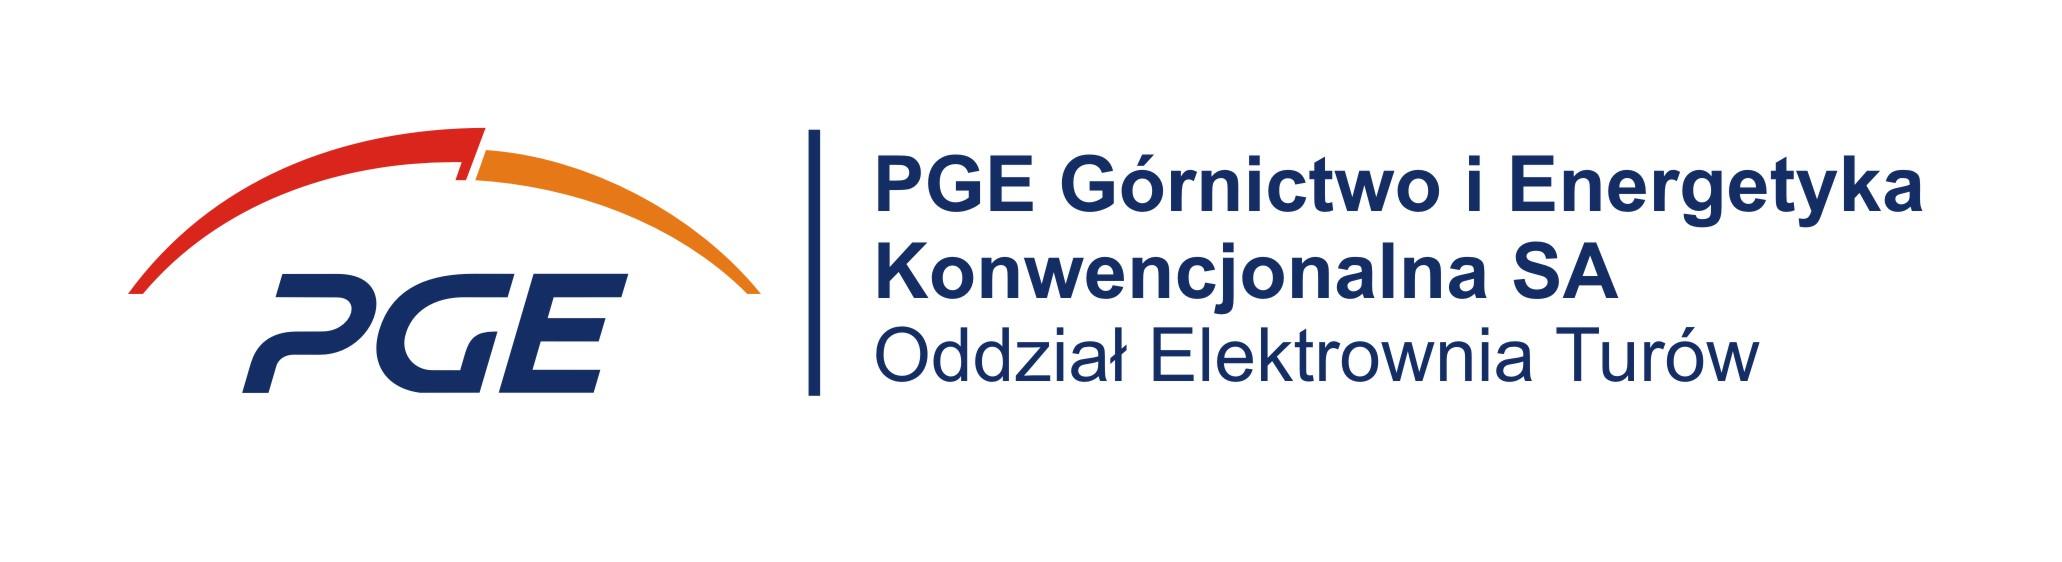 logo pionowe elektrownia turow